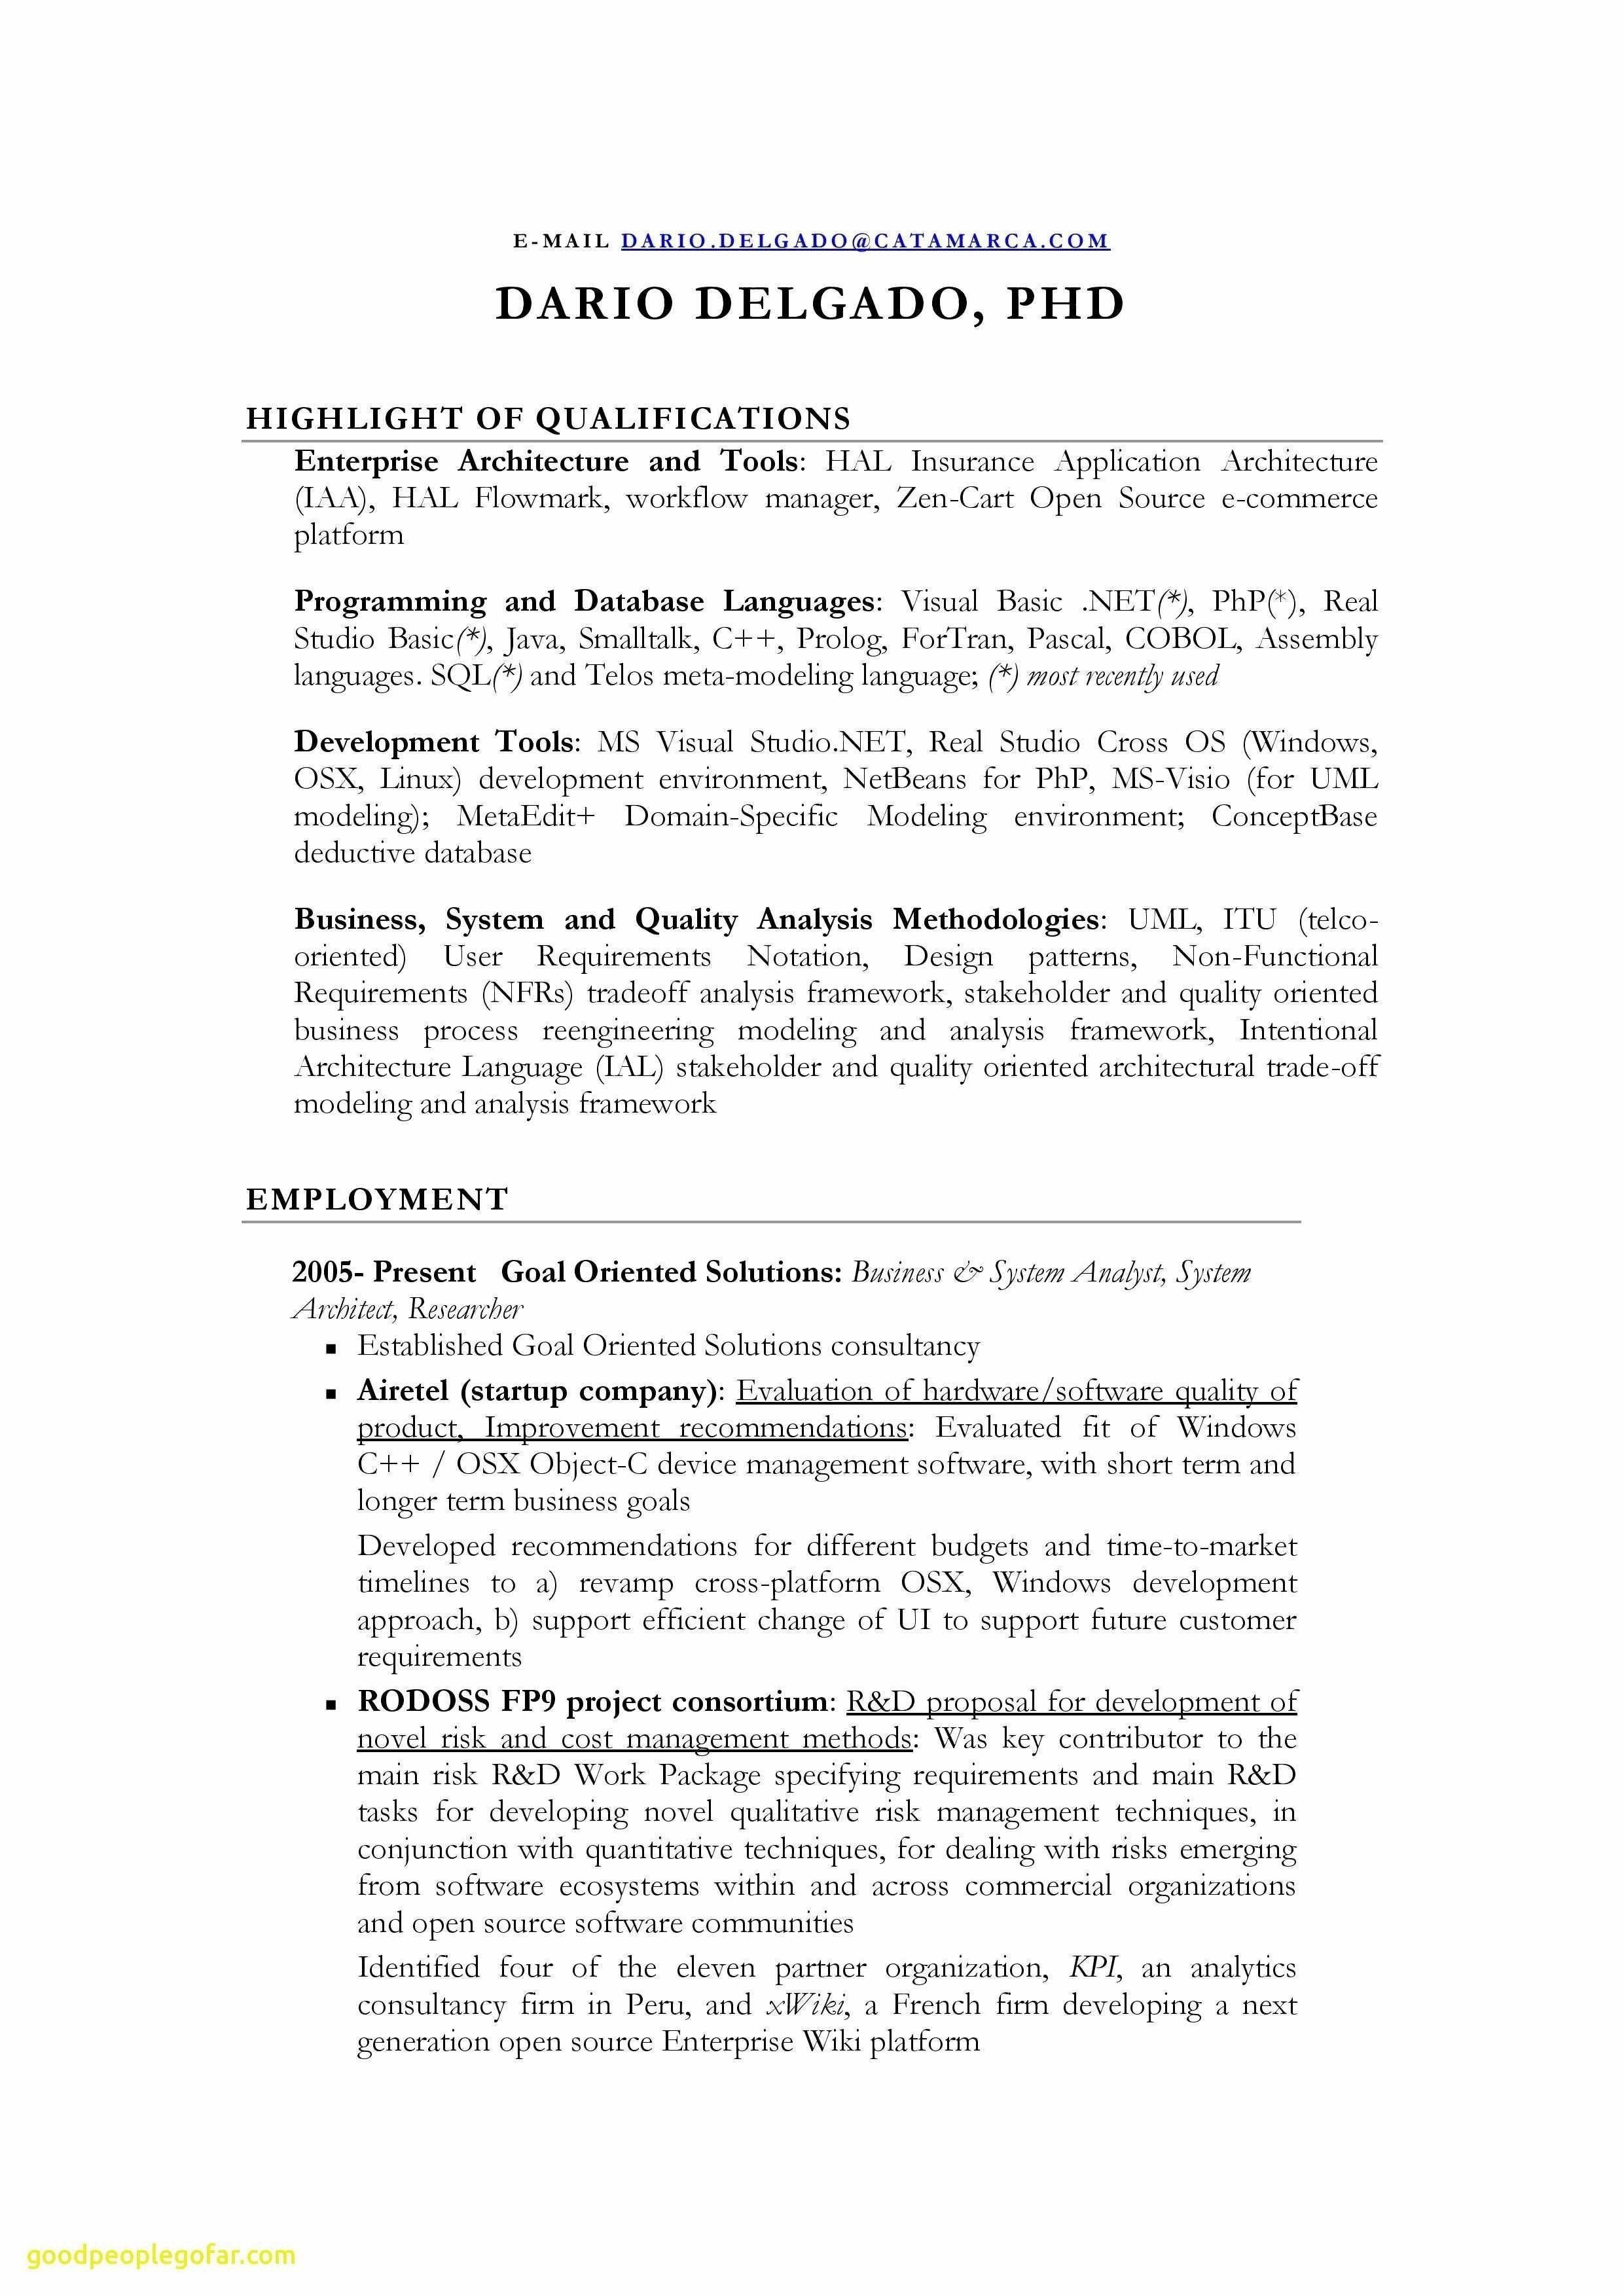 32 lovely professional resume writers nj in 2020 resume